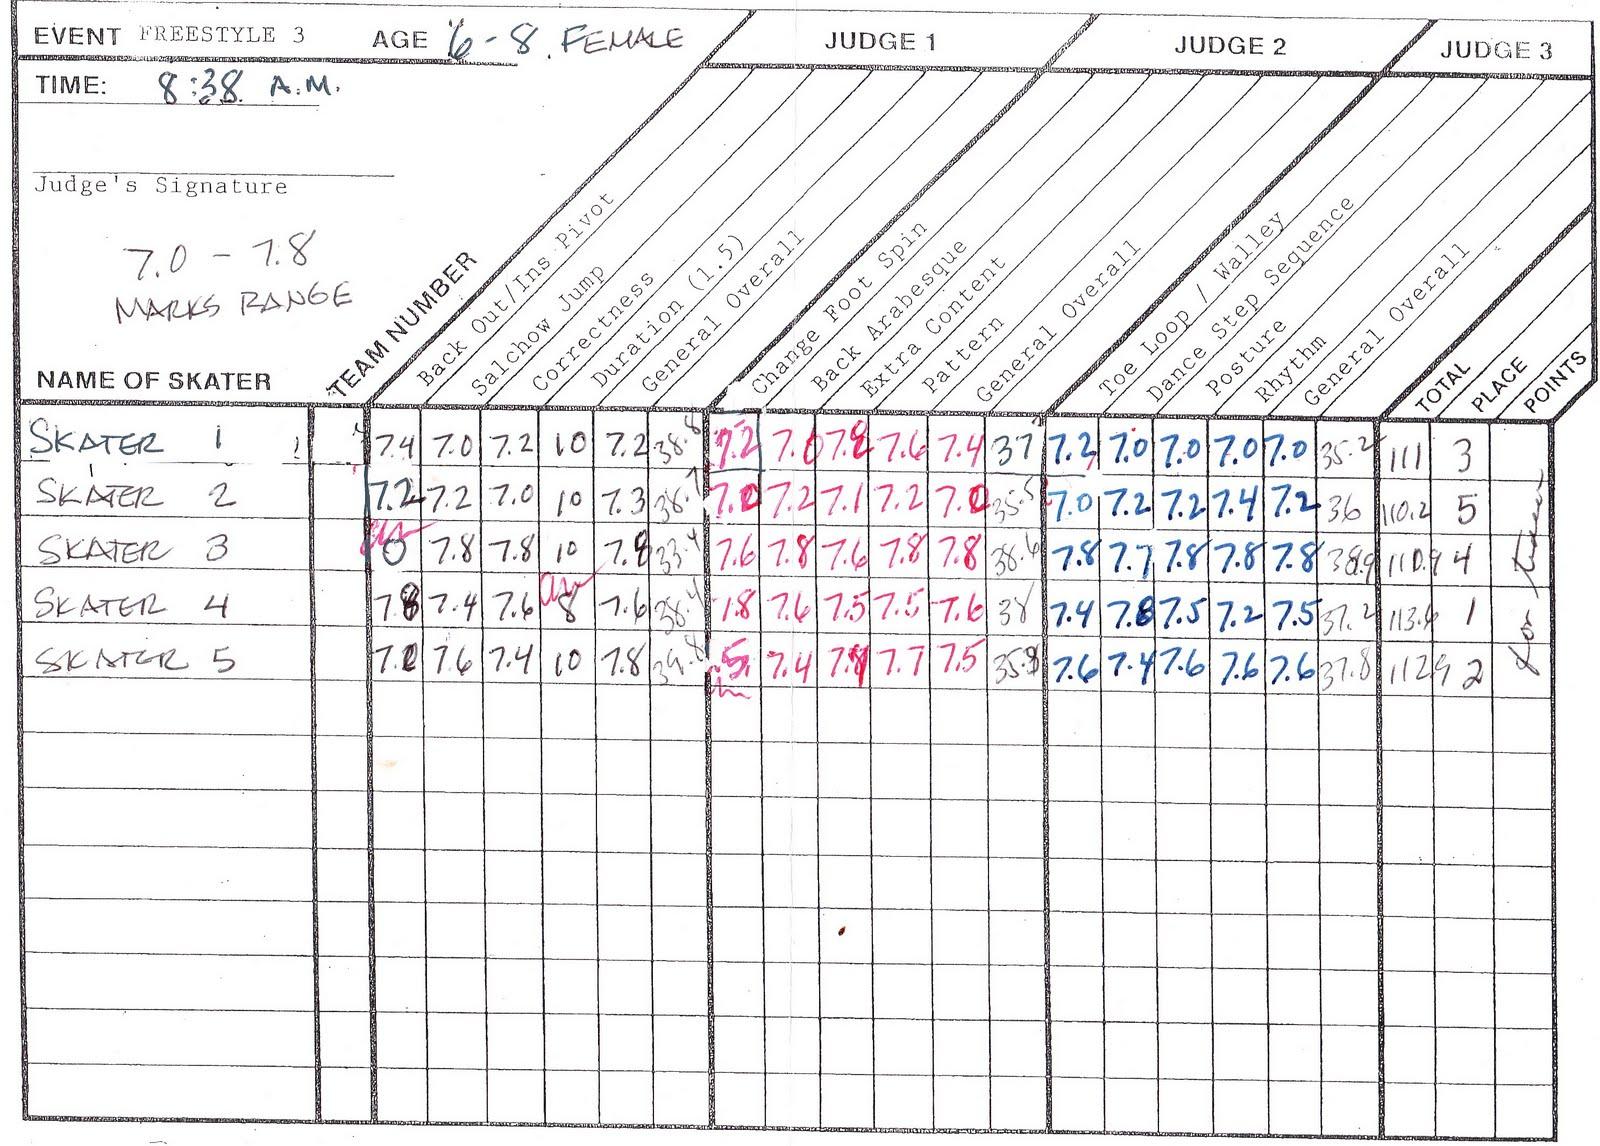 Xanboni: A sample ISI judging sheet, explained